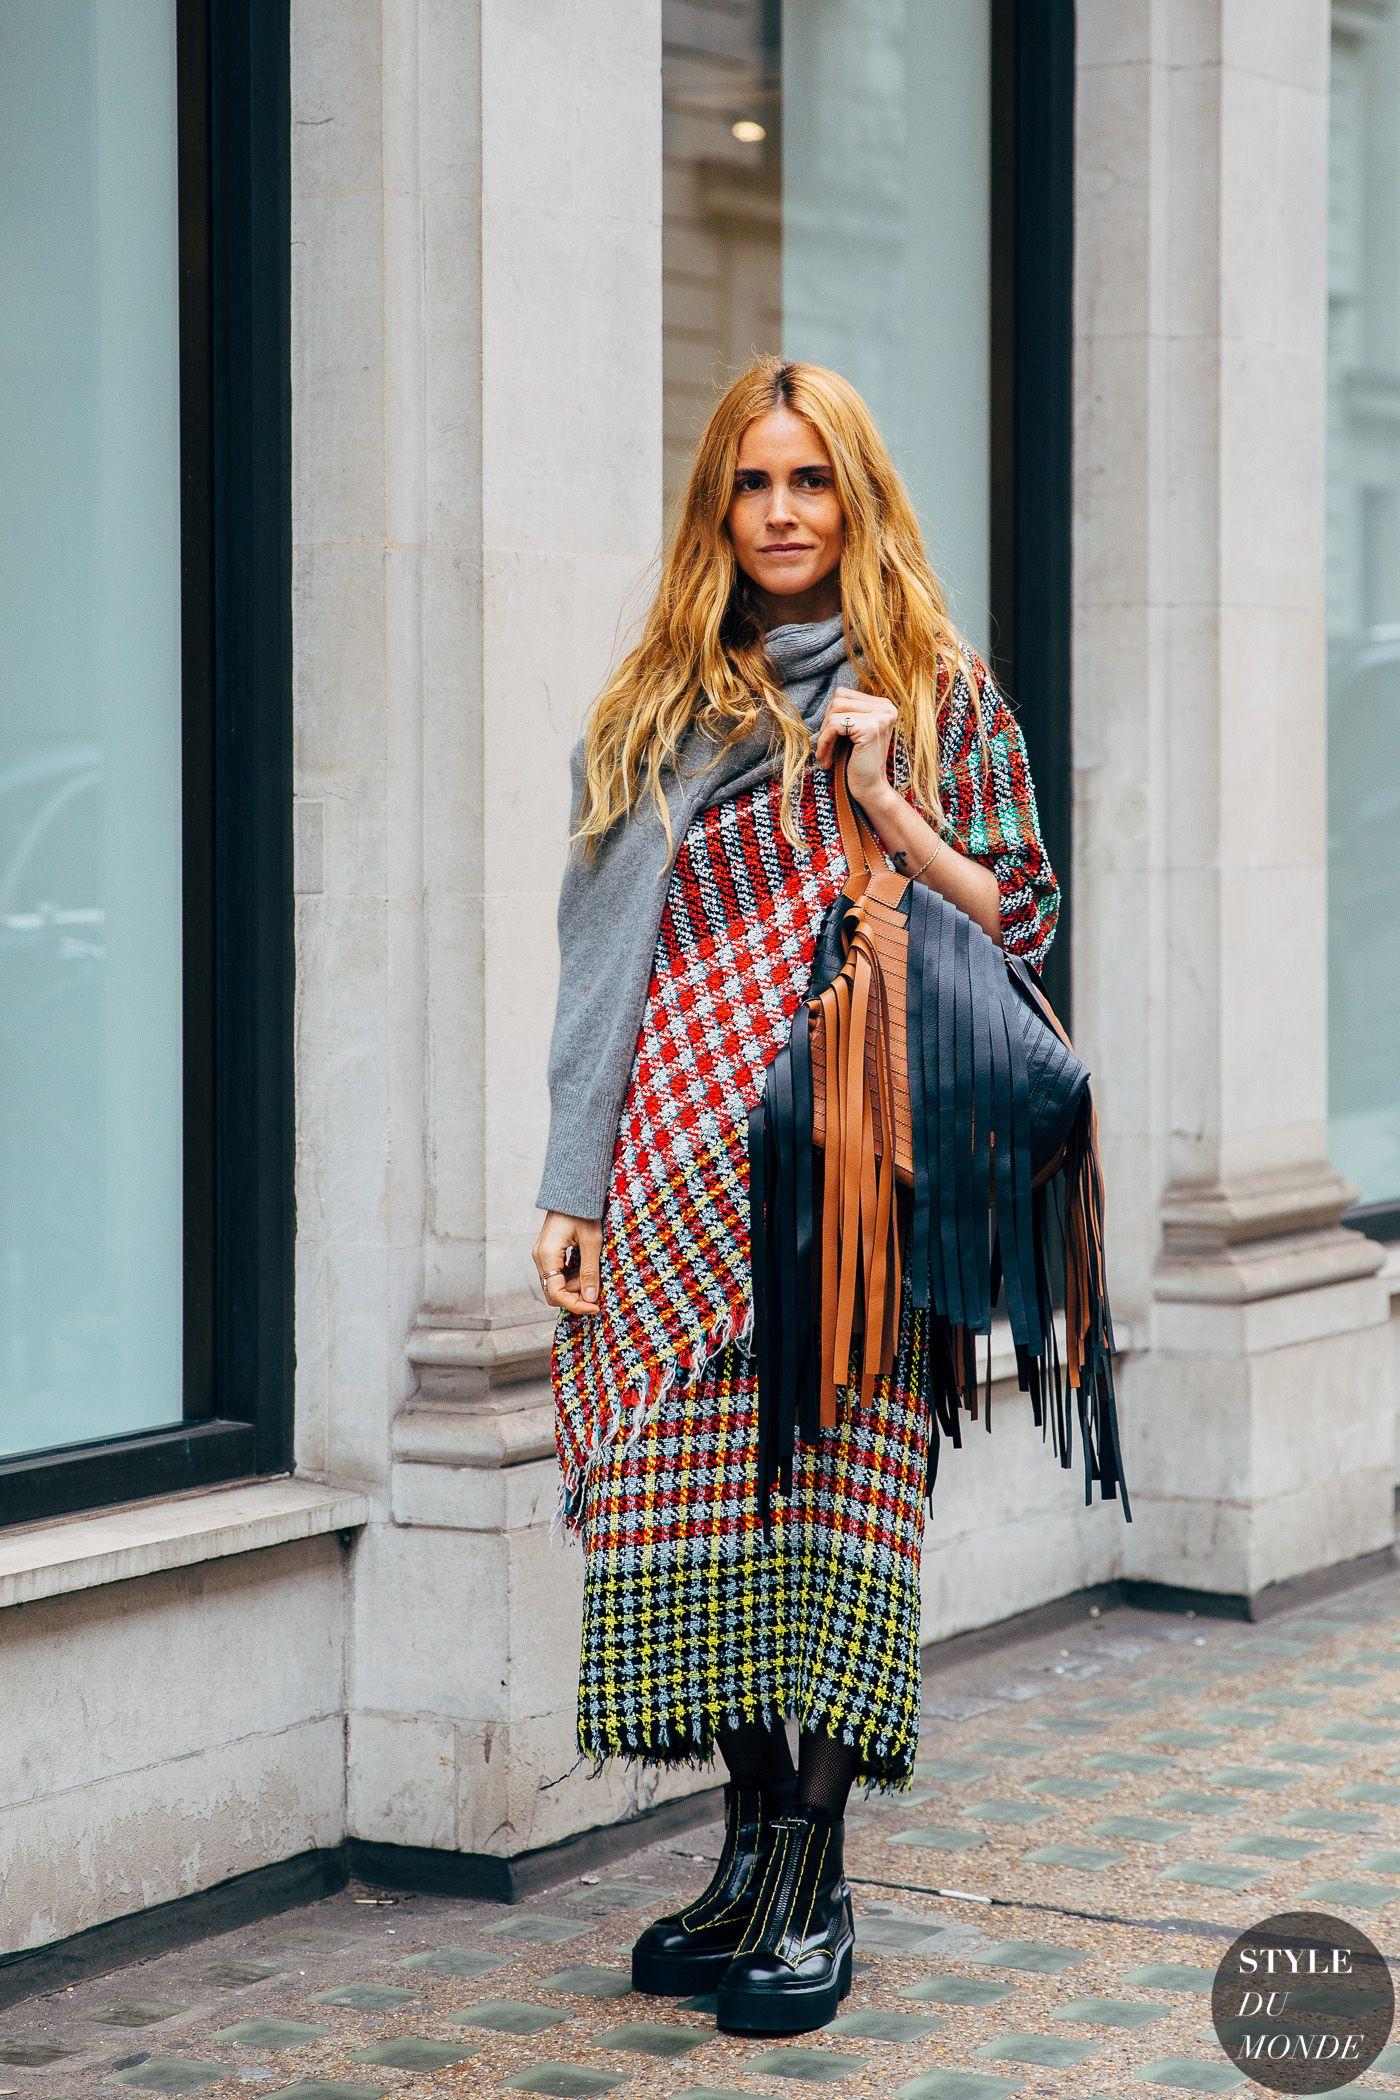 London FW 2019 Street Style: Blanca Miro Scrimieri